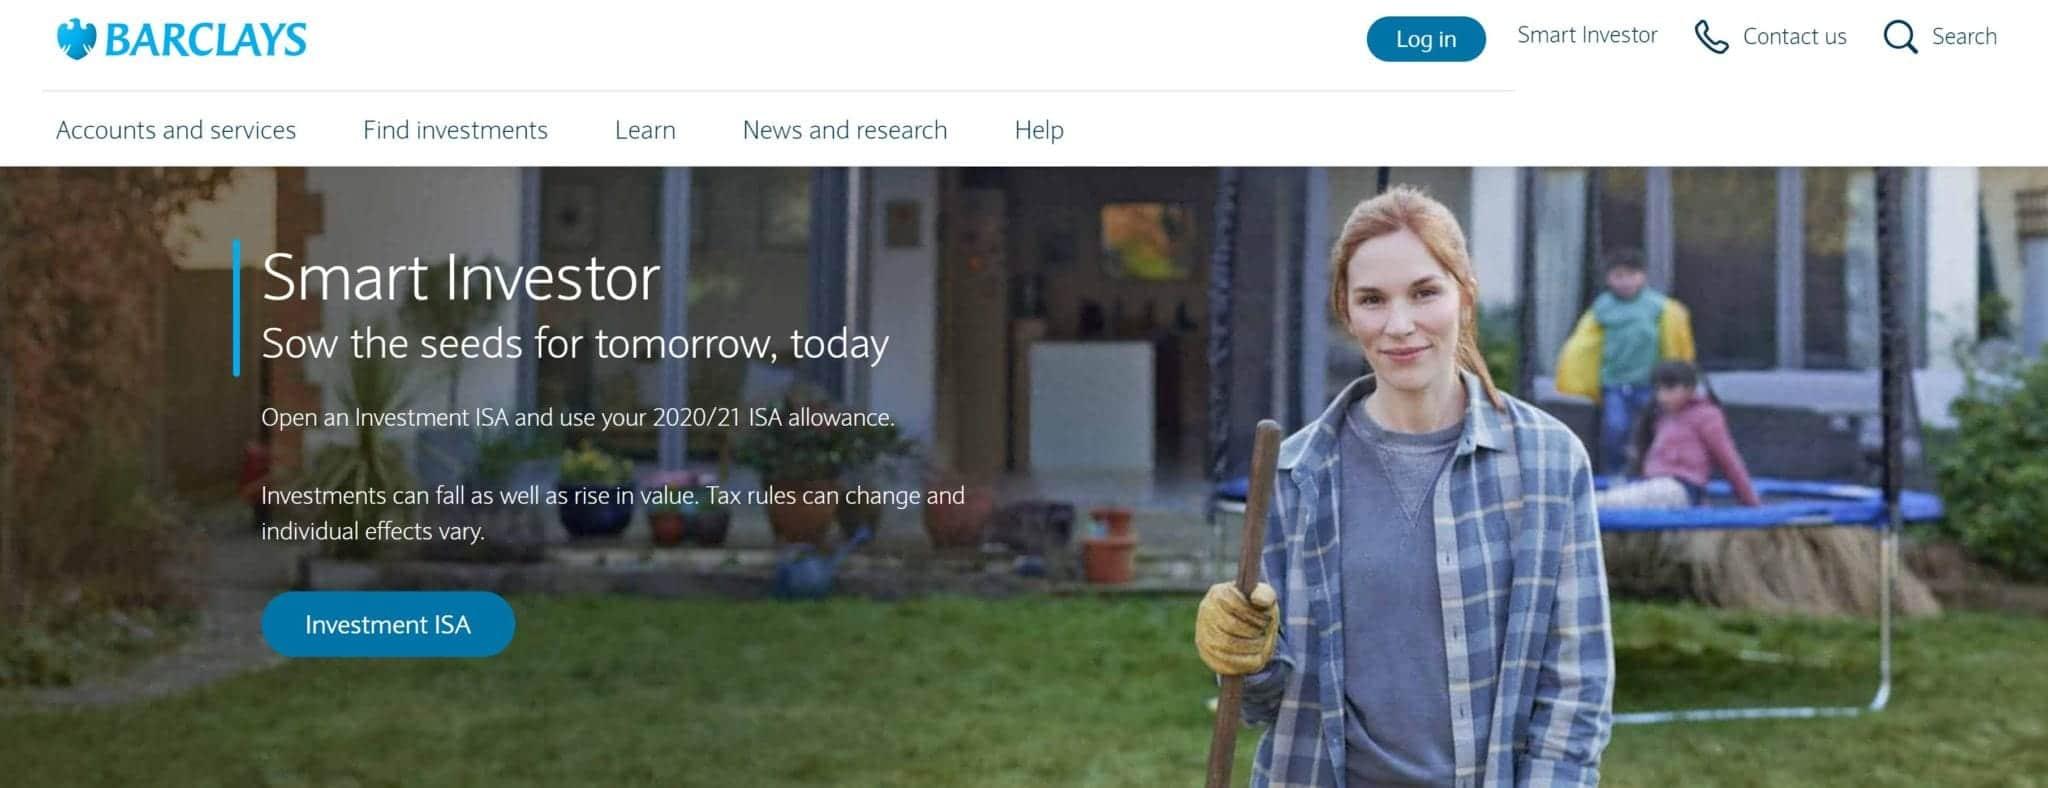 Barclays Smart Investor homepage